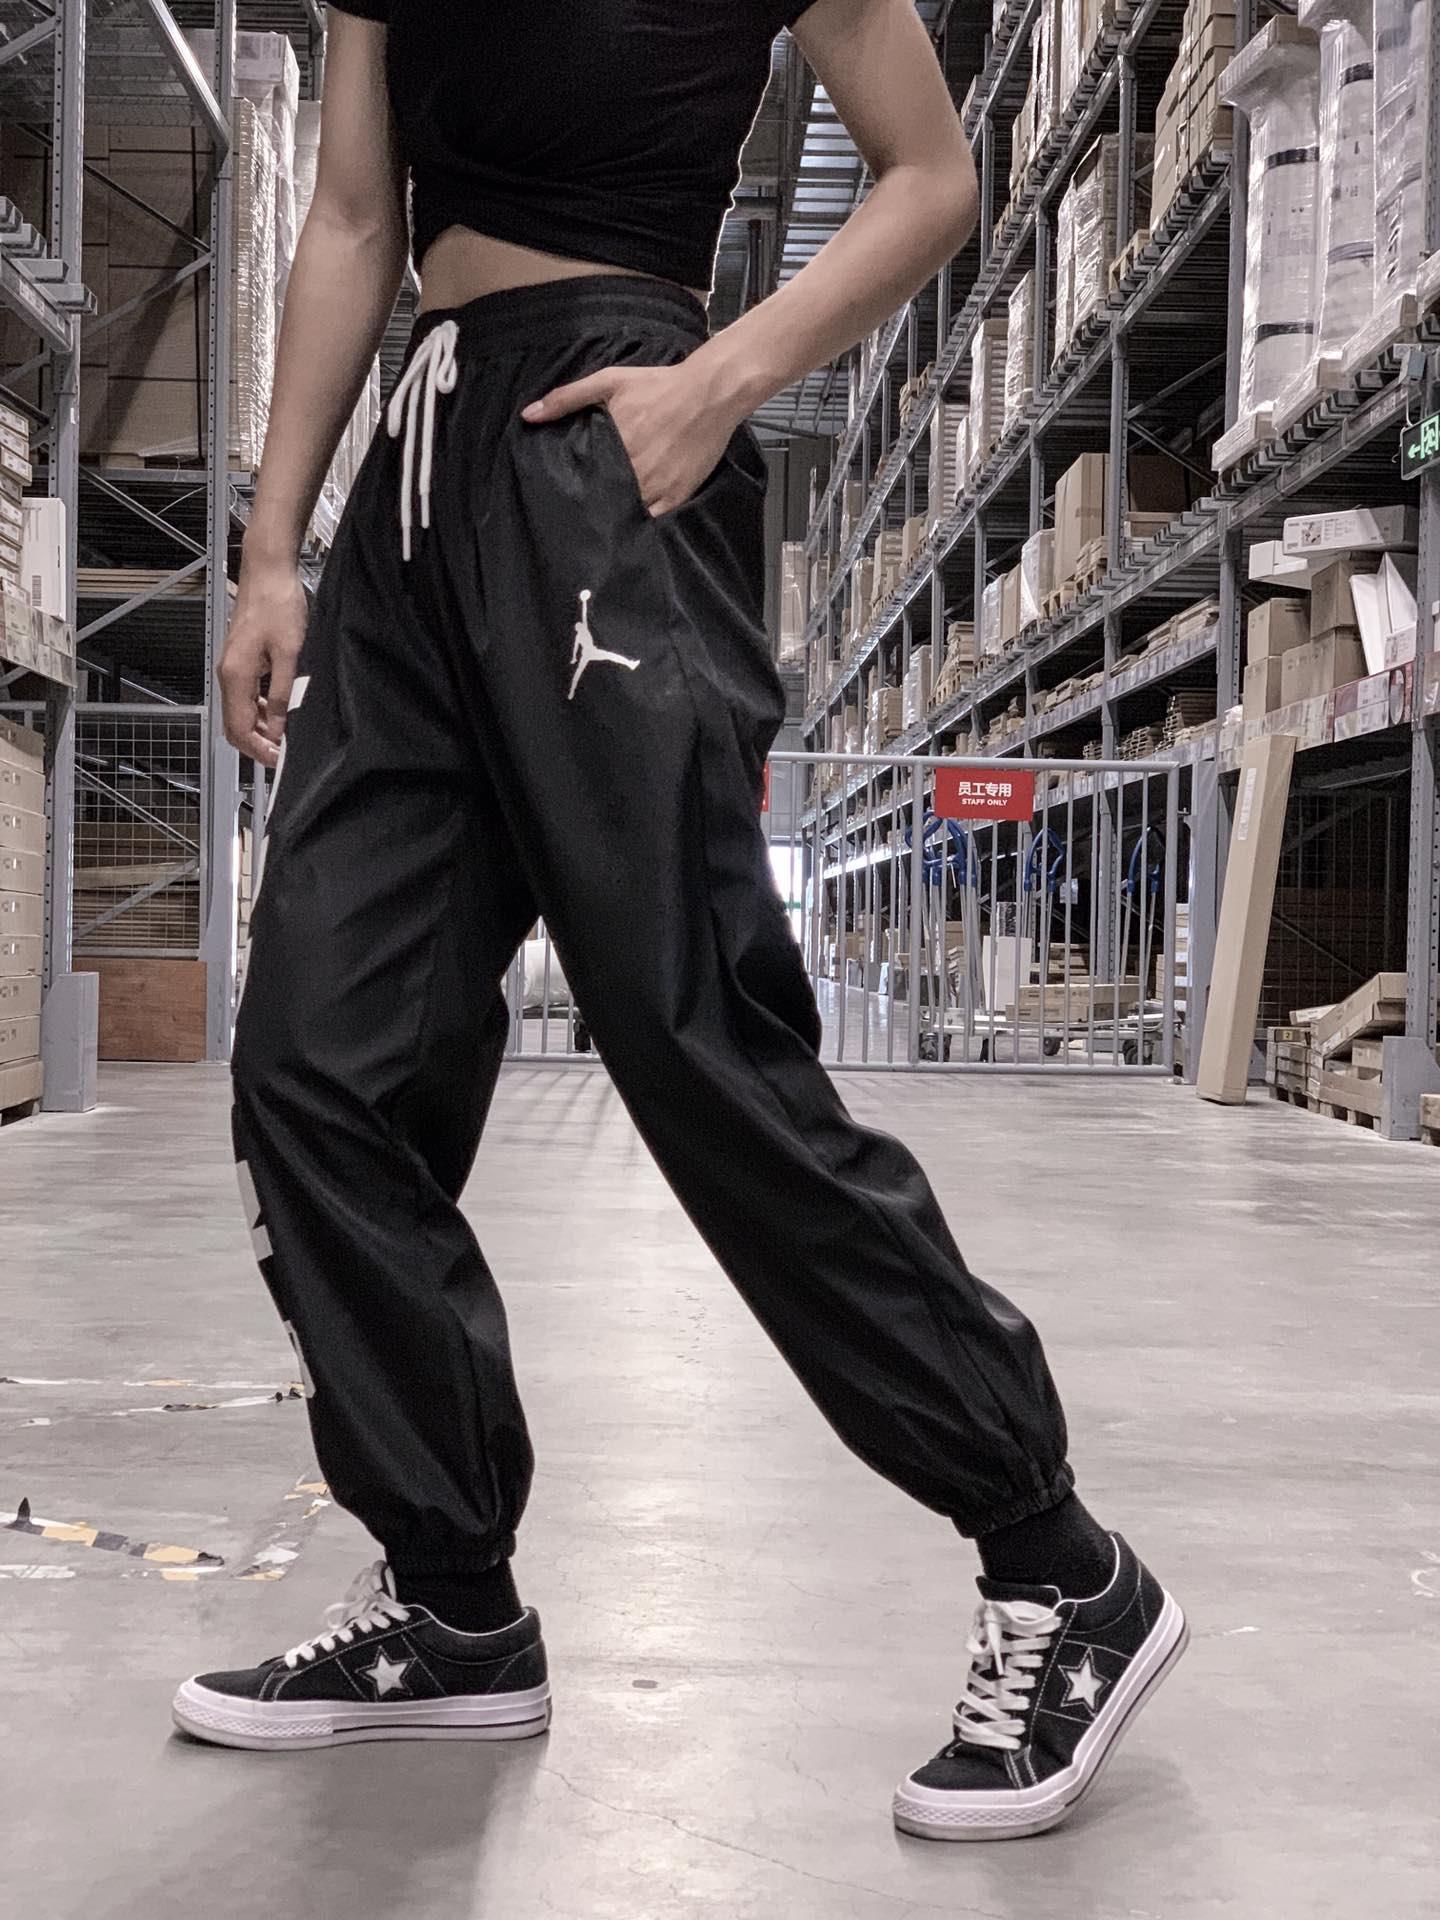 ??70    Air Jordan/乔丹23 复古运动裤,情侣款束脚裤  法国纳米